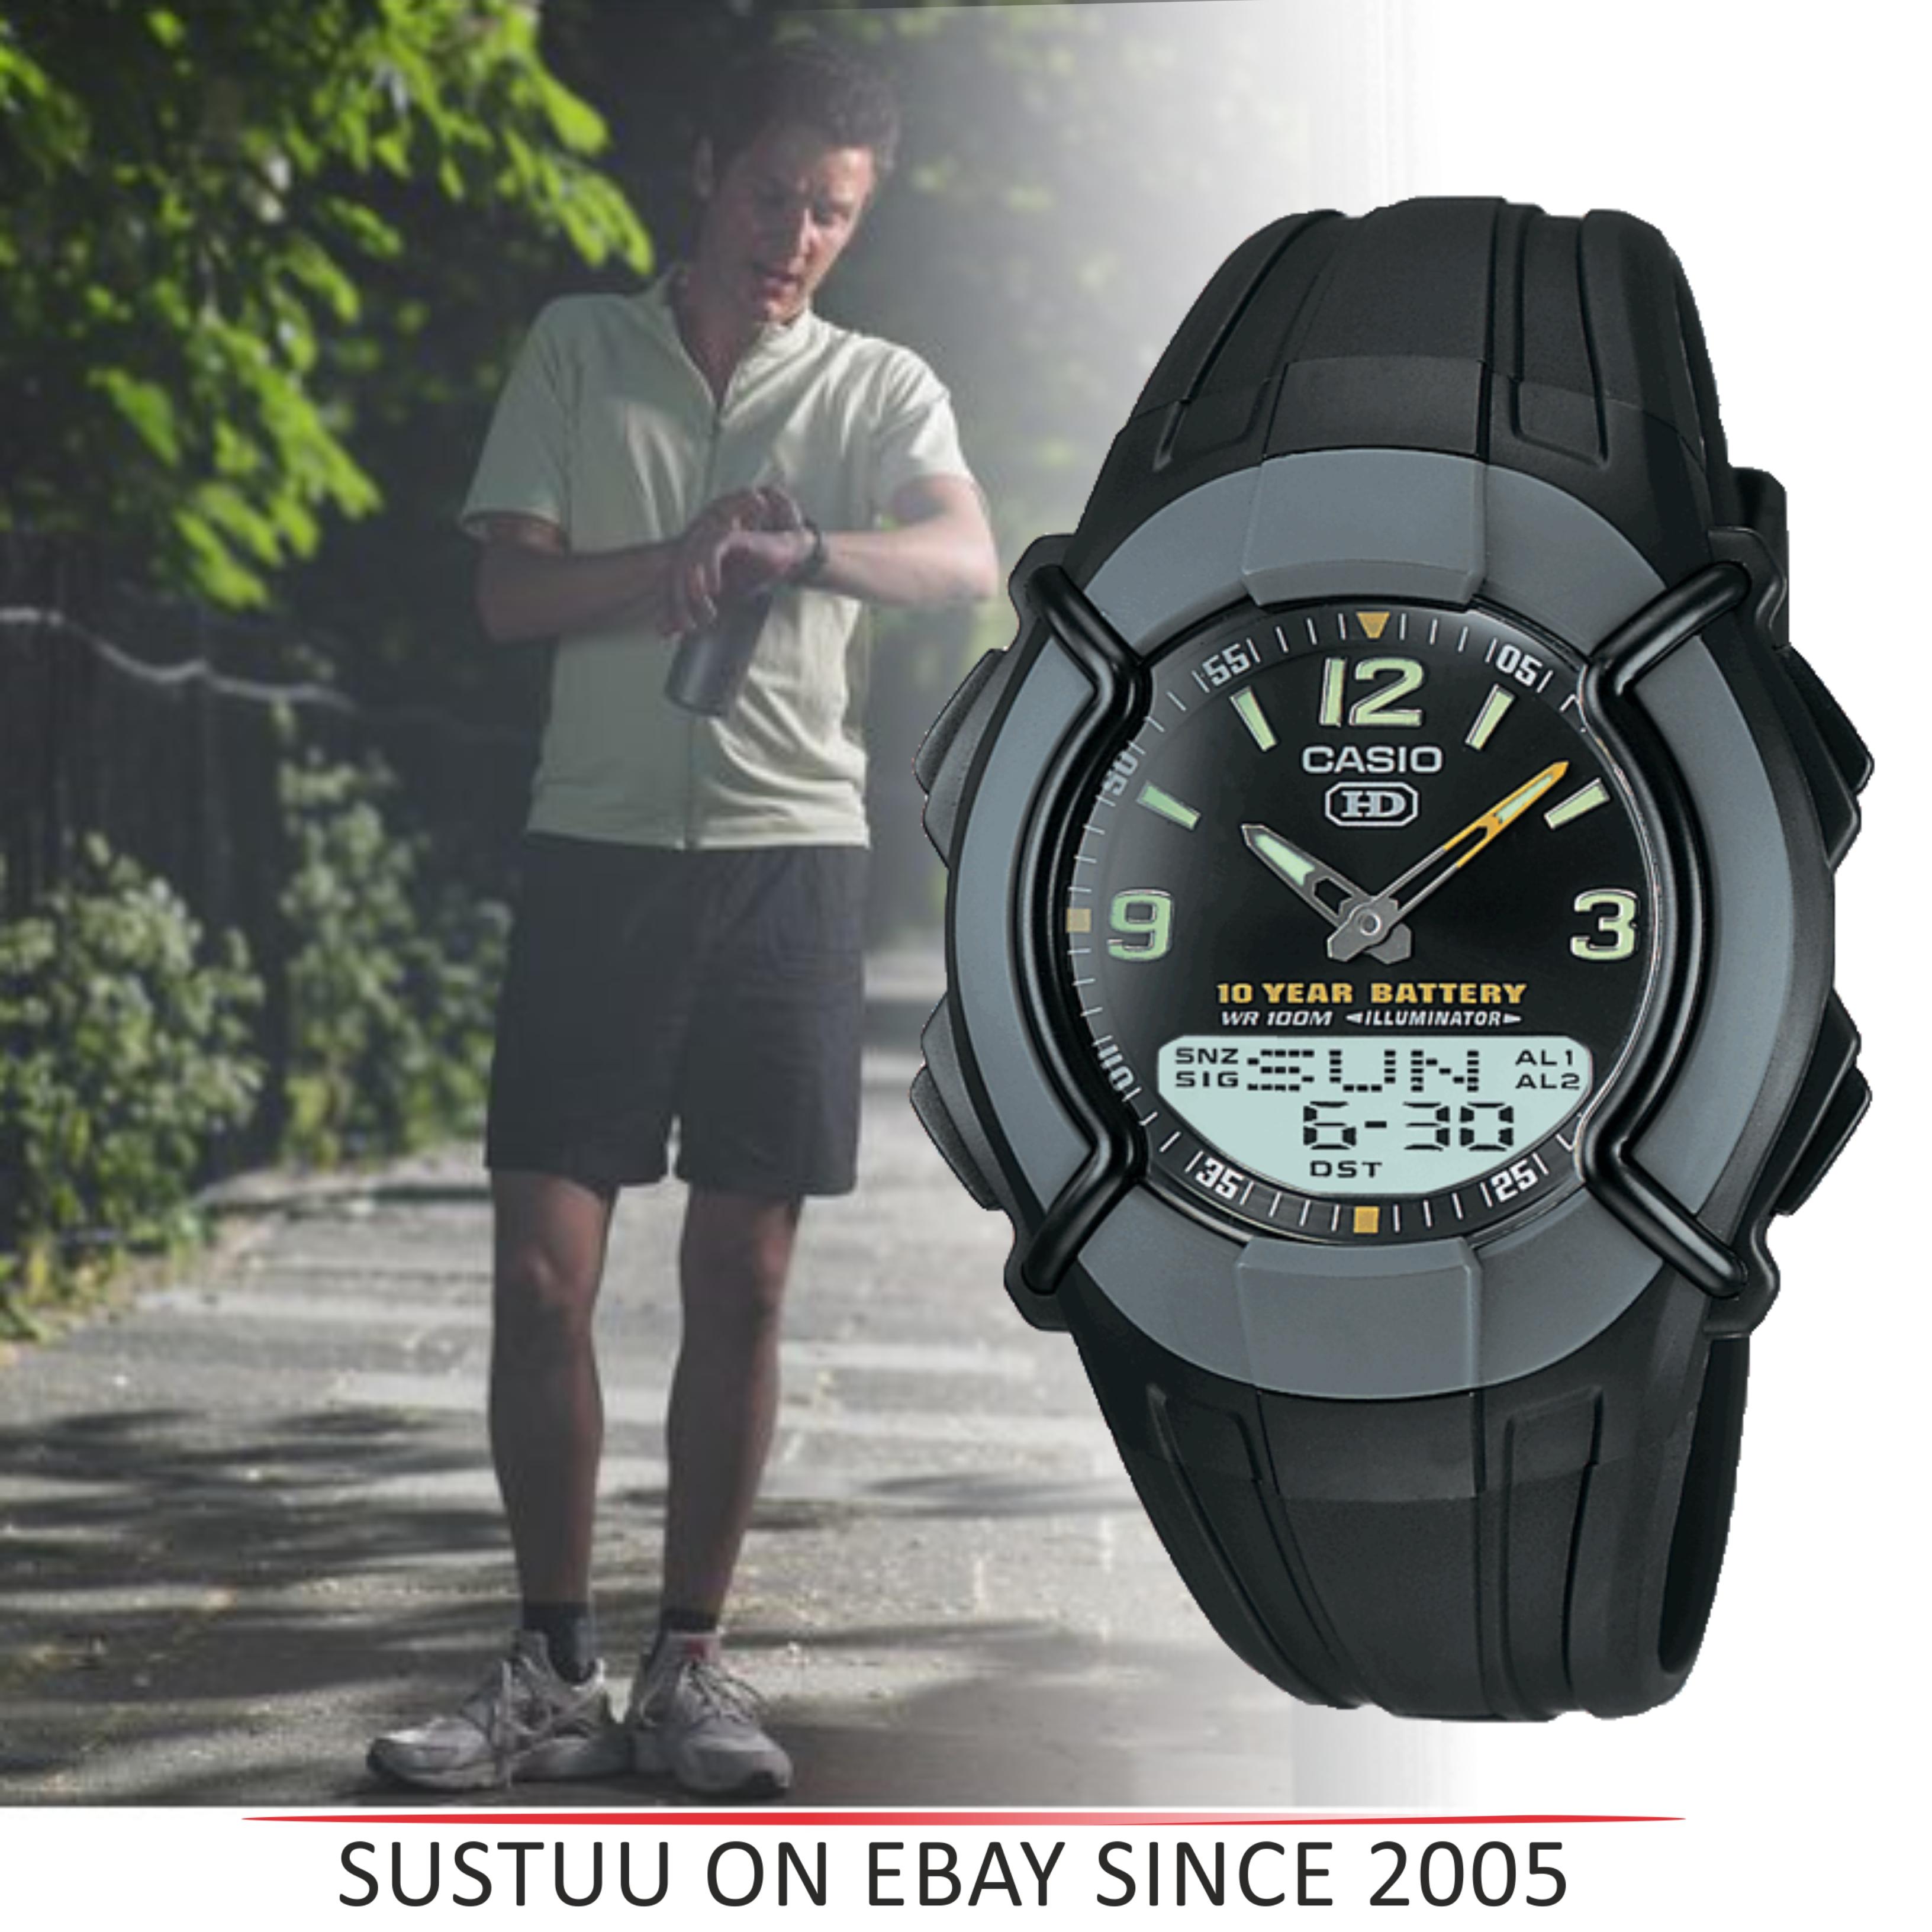 casio men s hd heavy duty combination sports world time 100m watch rh ebay co uk manual reloj casio hdc-600 casio hdc-600 user manual